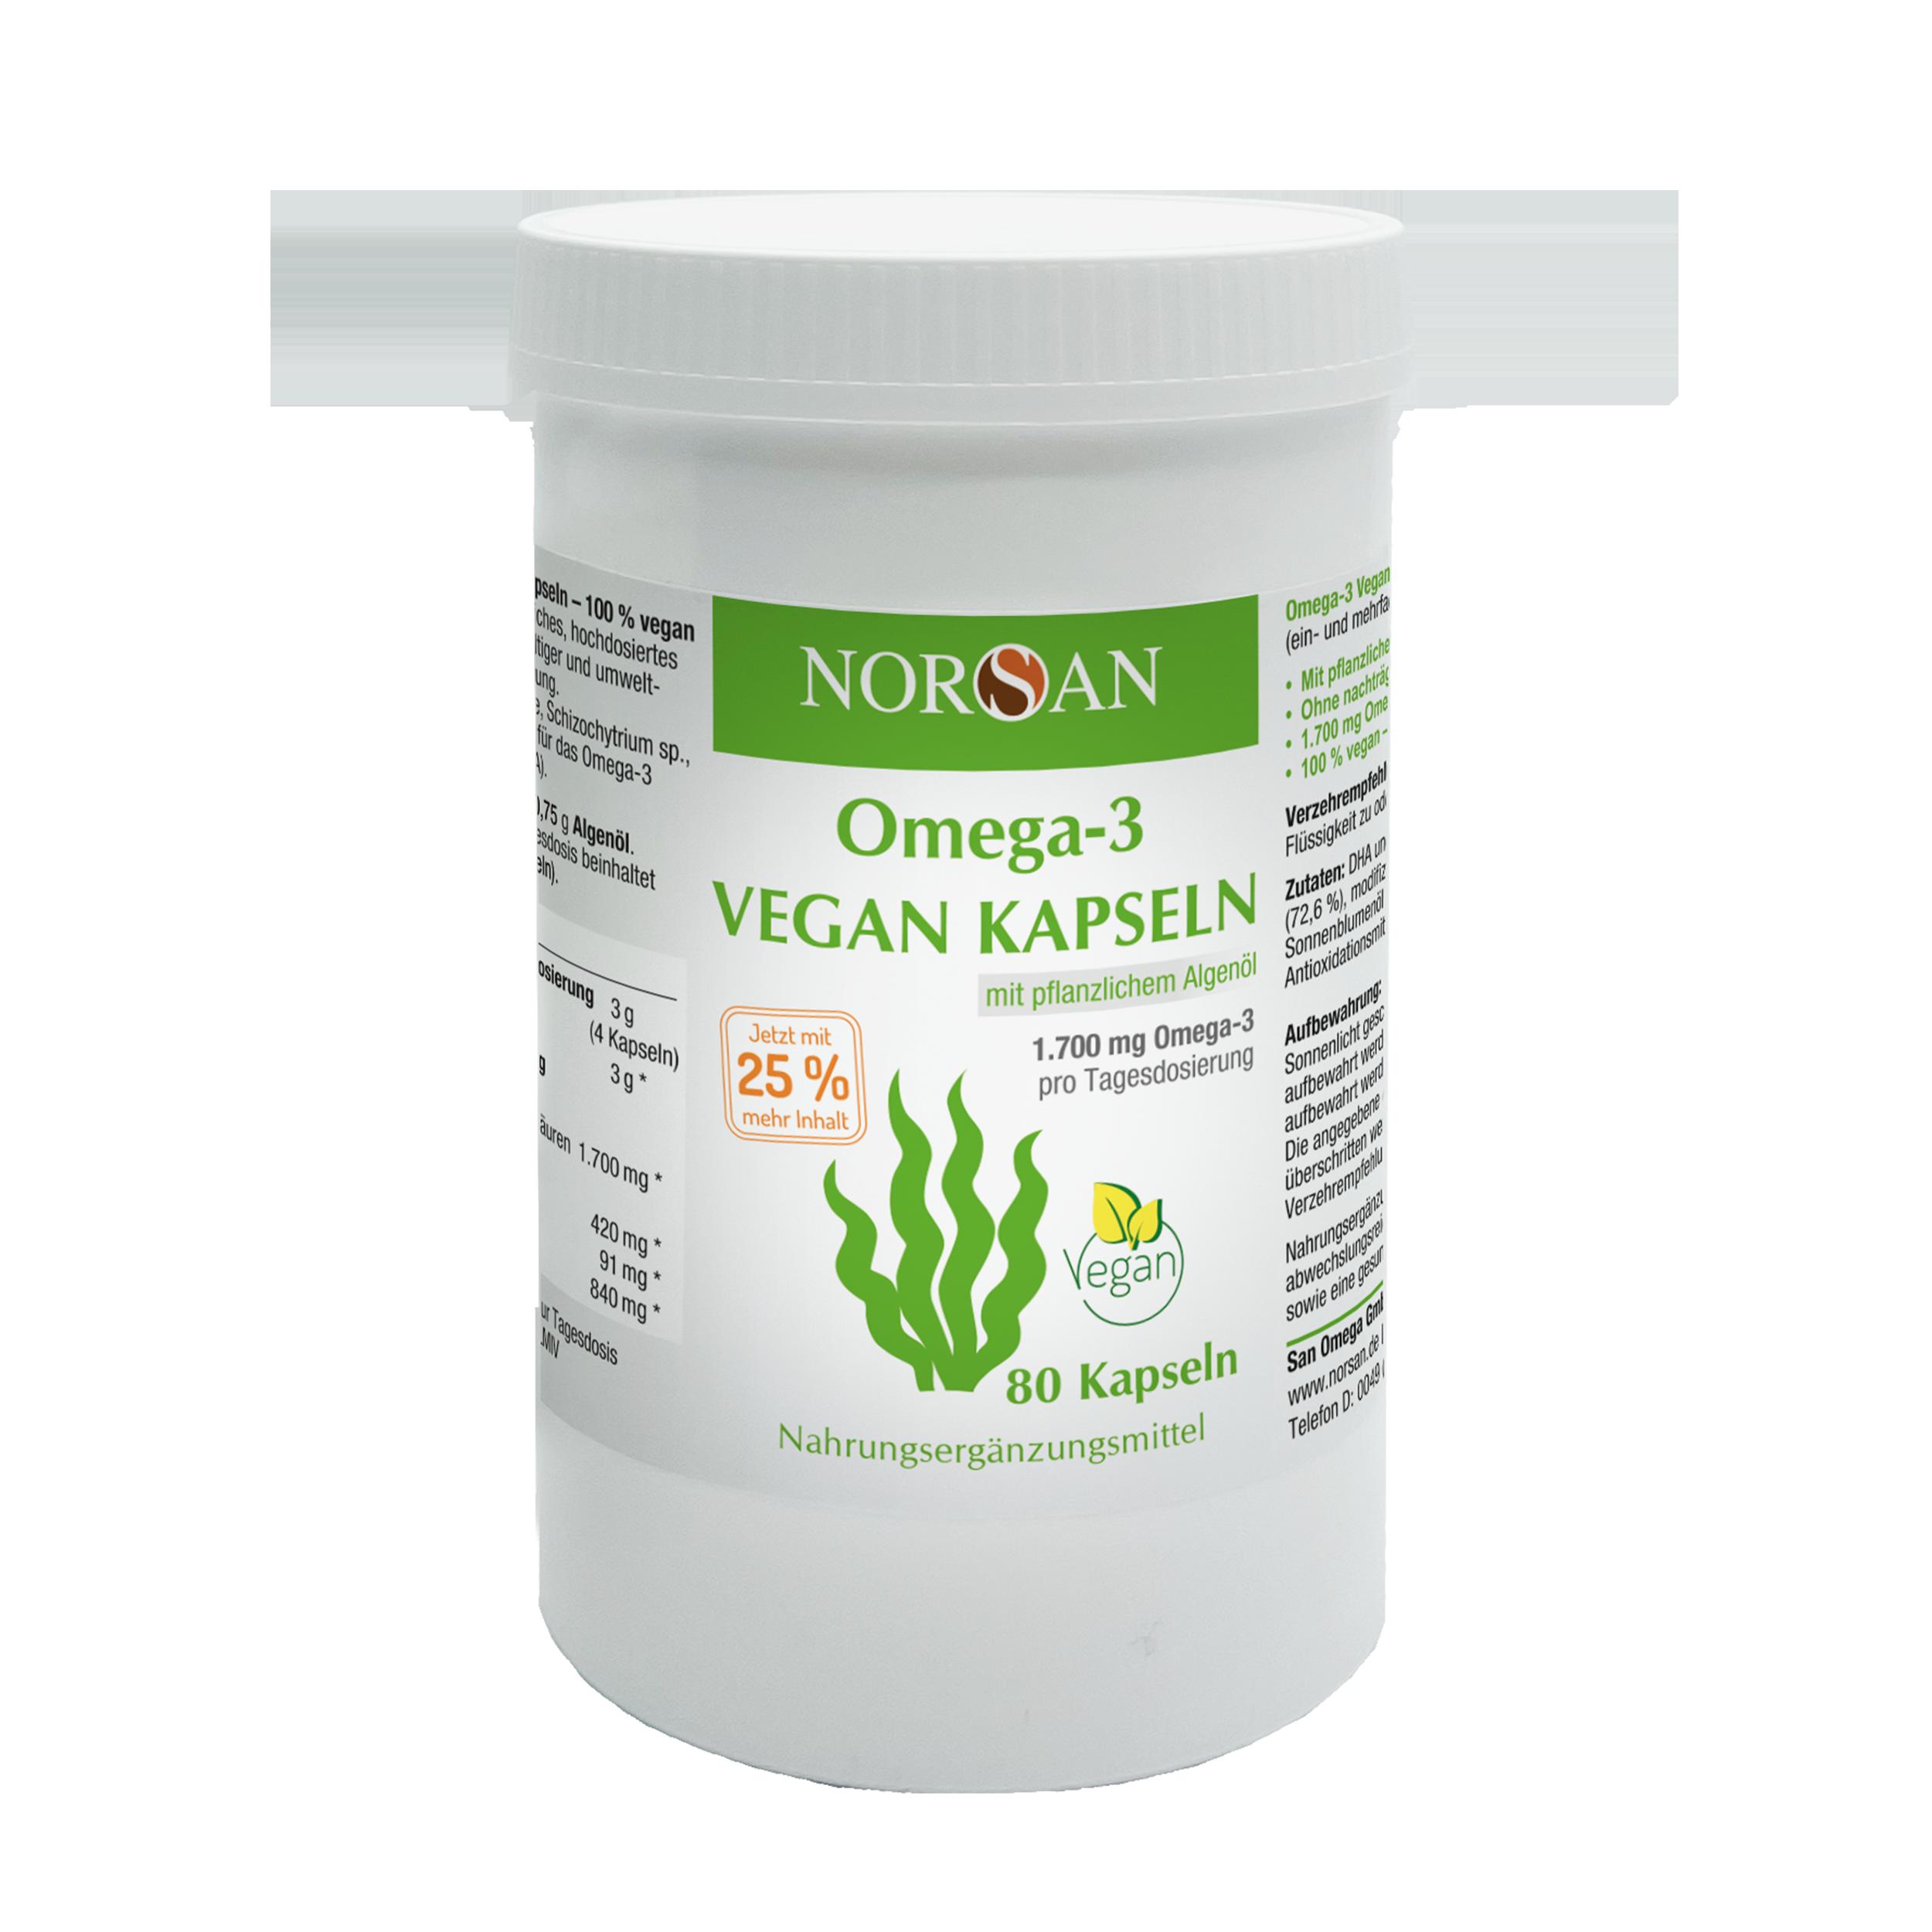 Norsan Omega 3 Vegan